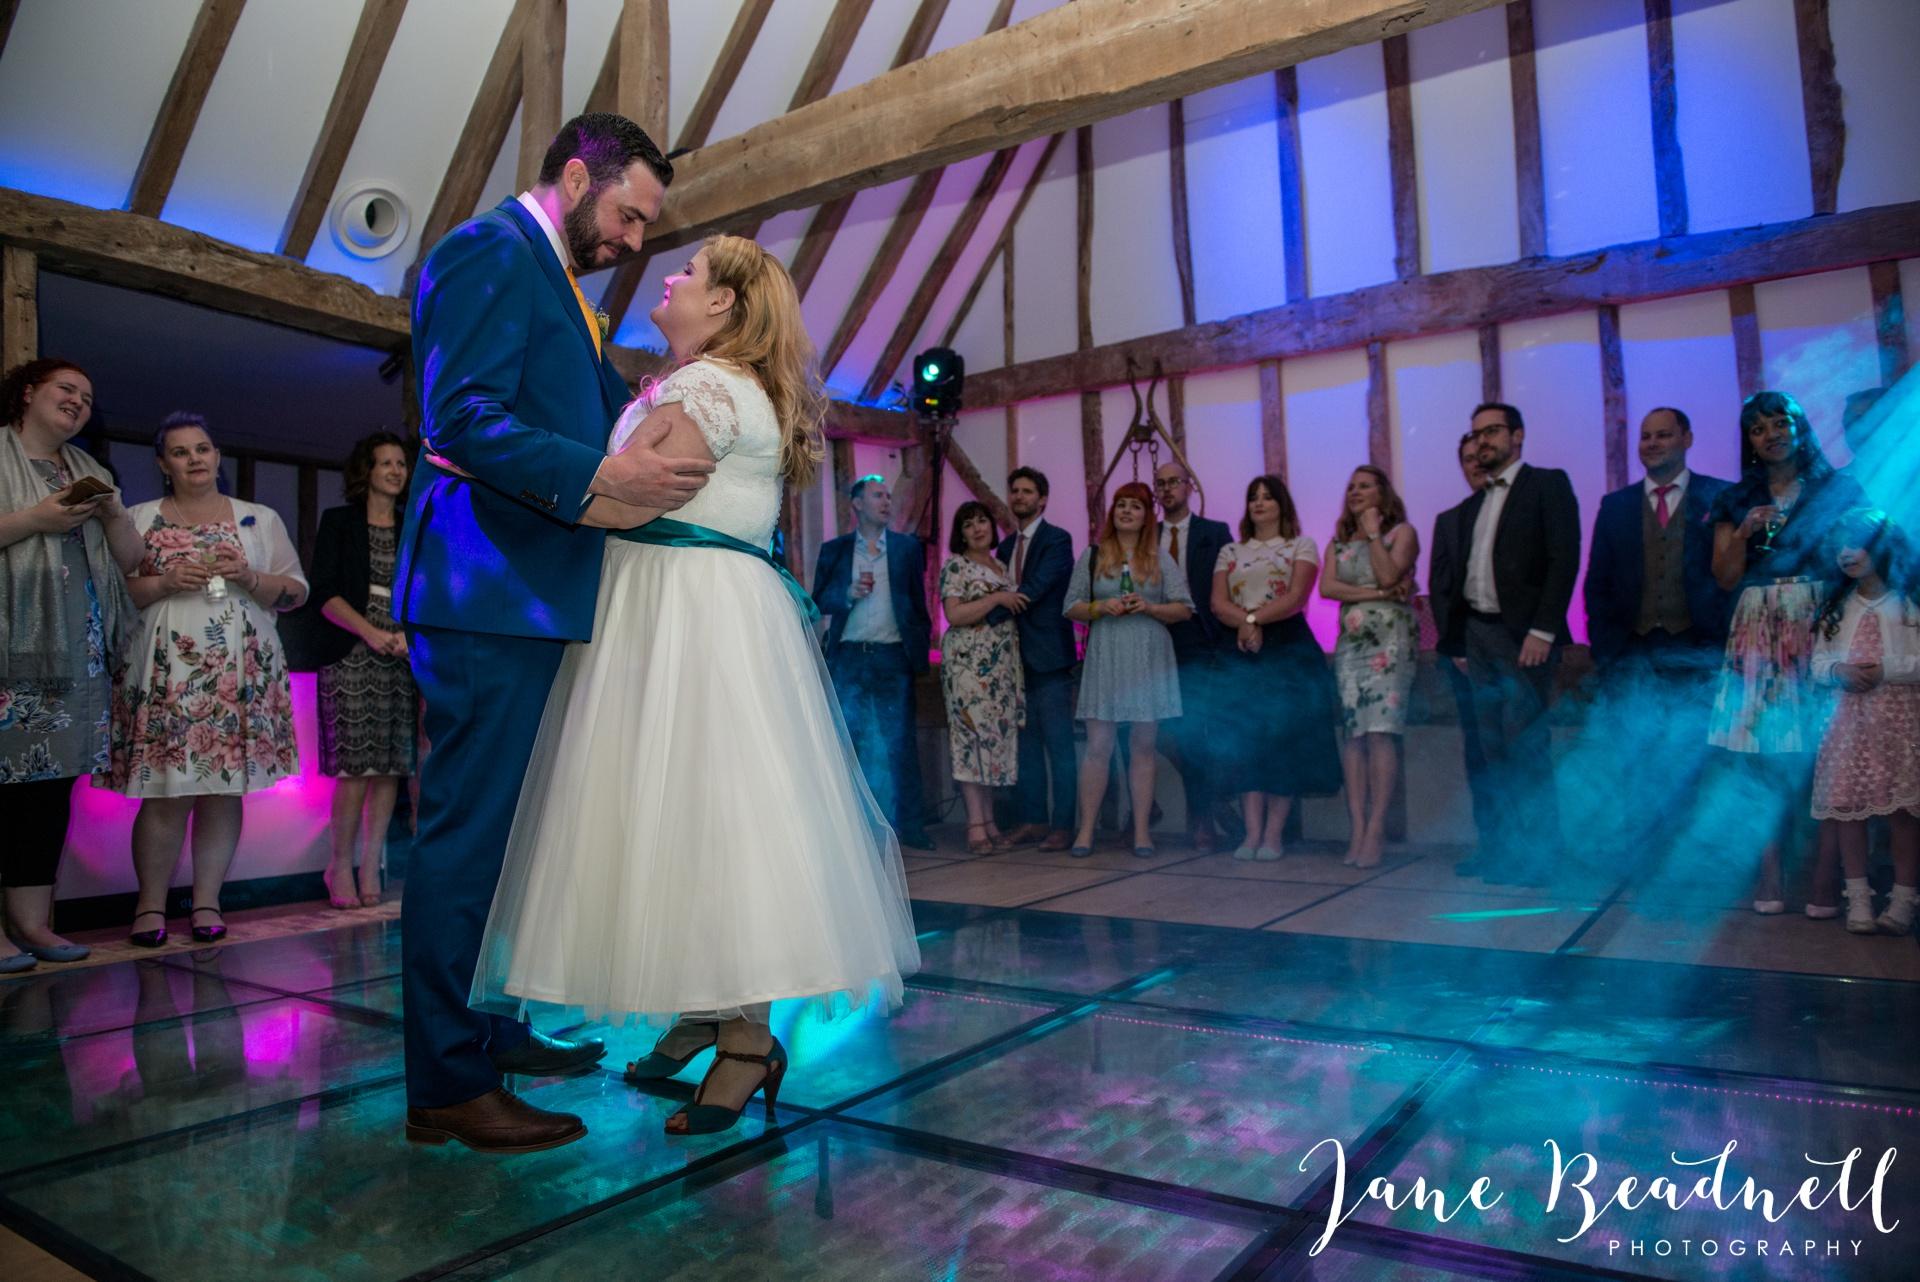 South Farm Wedding photography Hertfordshire by Jane Beadnell Photography fine art wedding photographer_0212